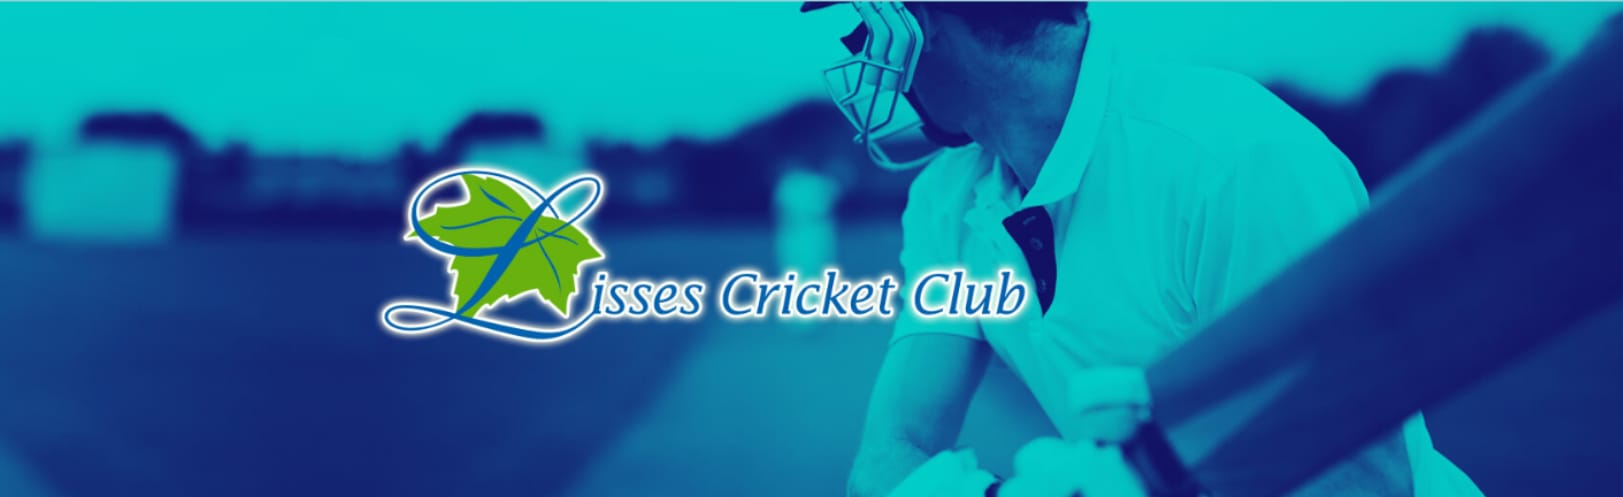 Lisses Cricket Club